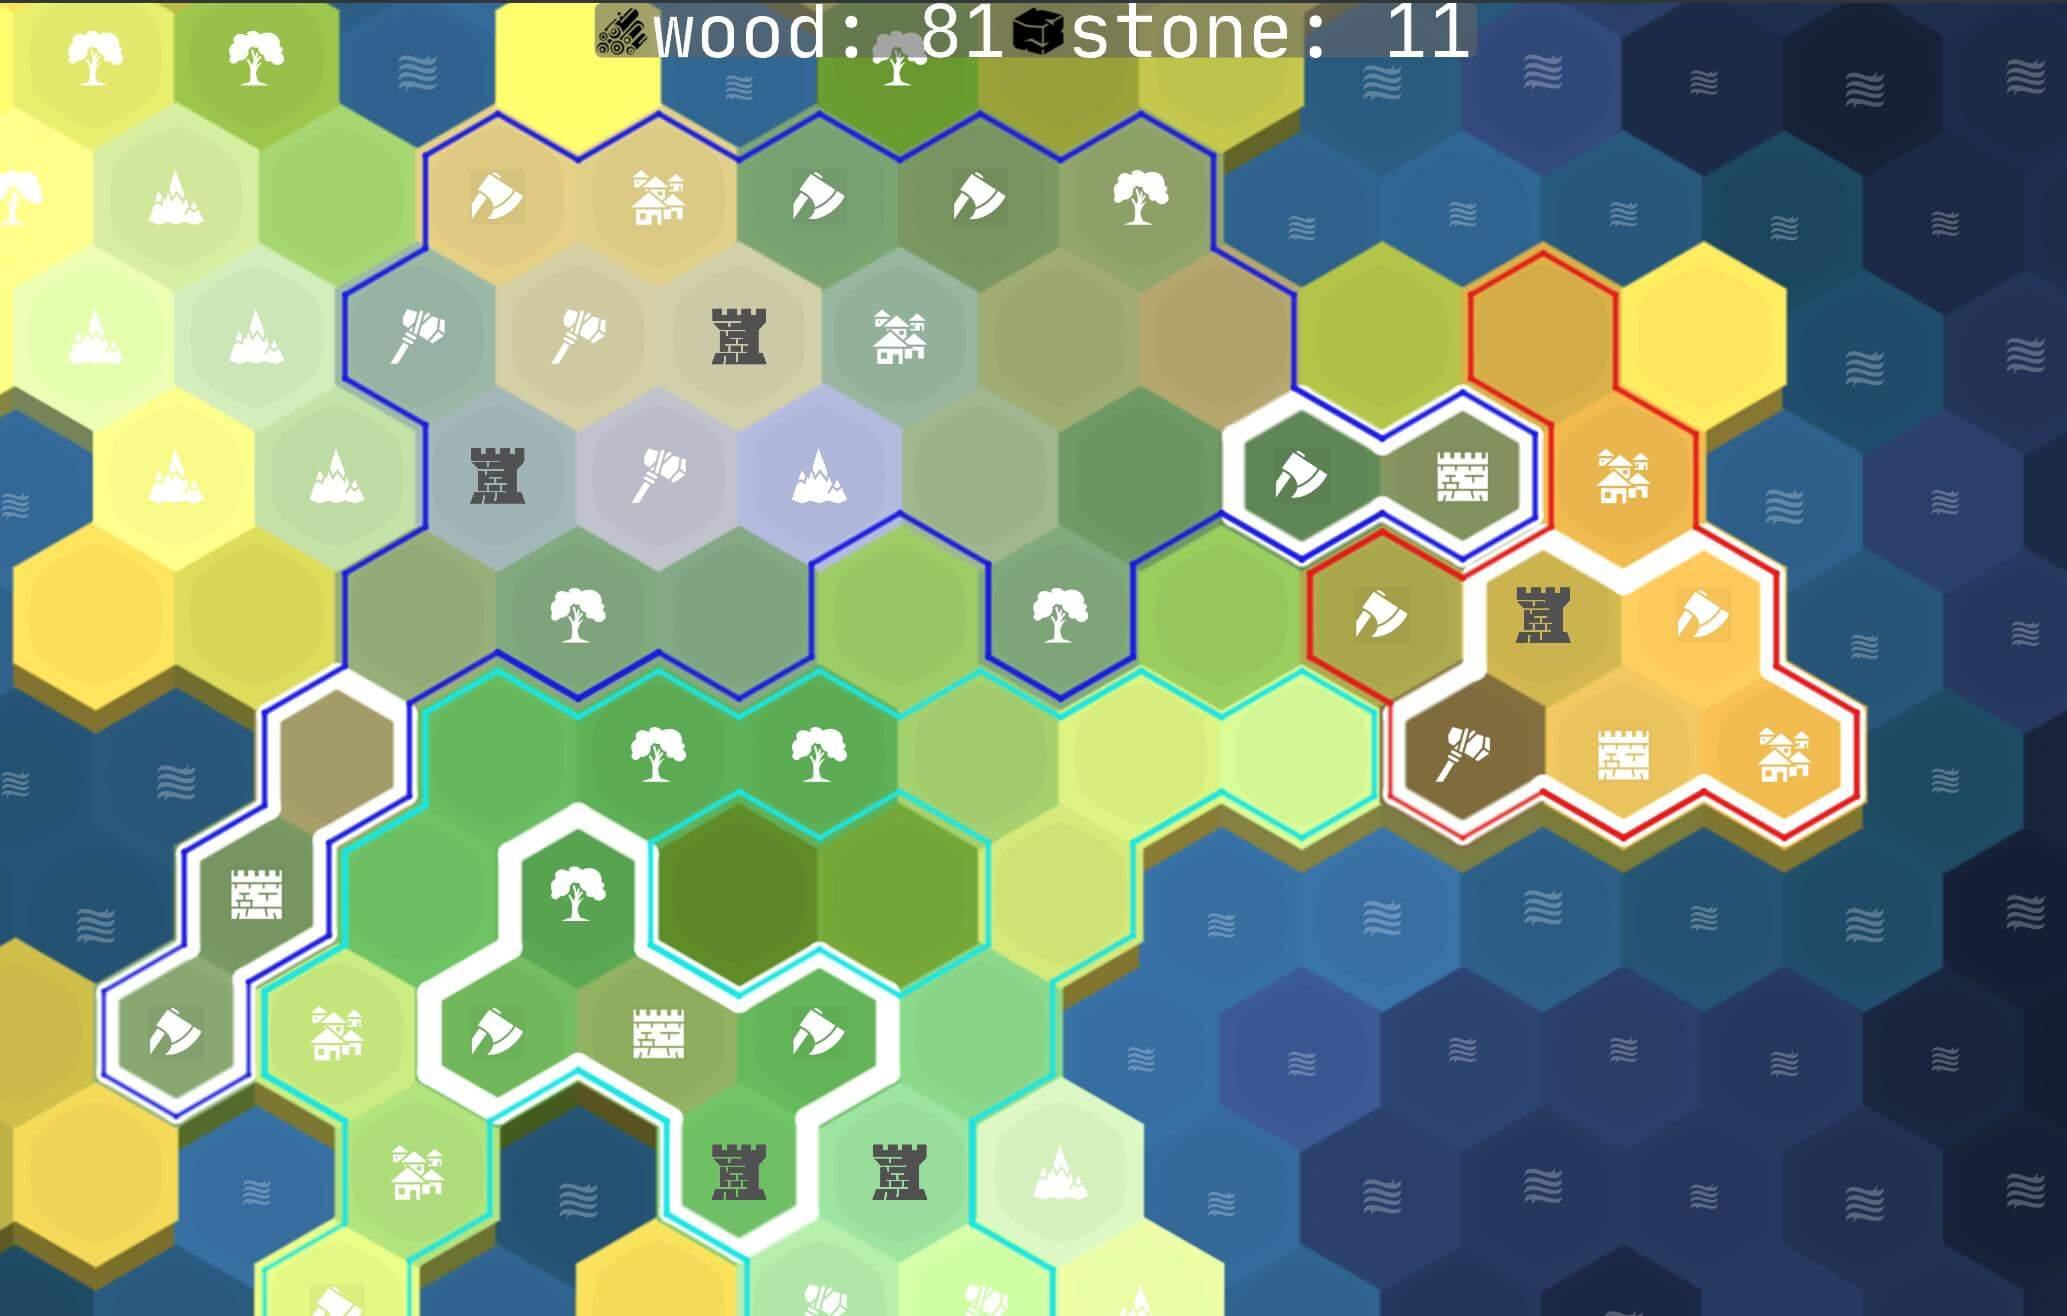 hexagonal strategy map with region borders